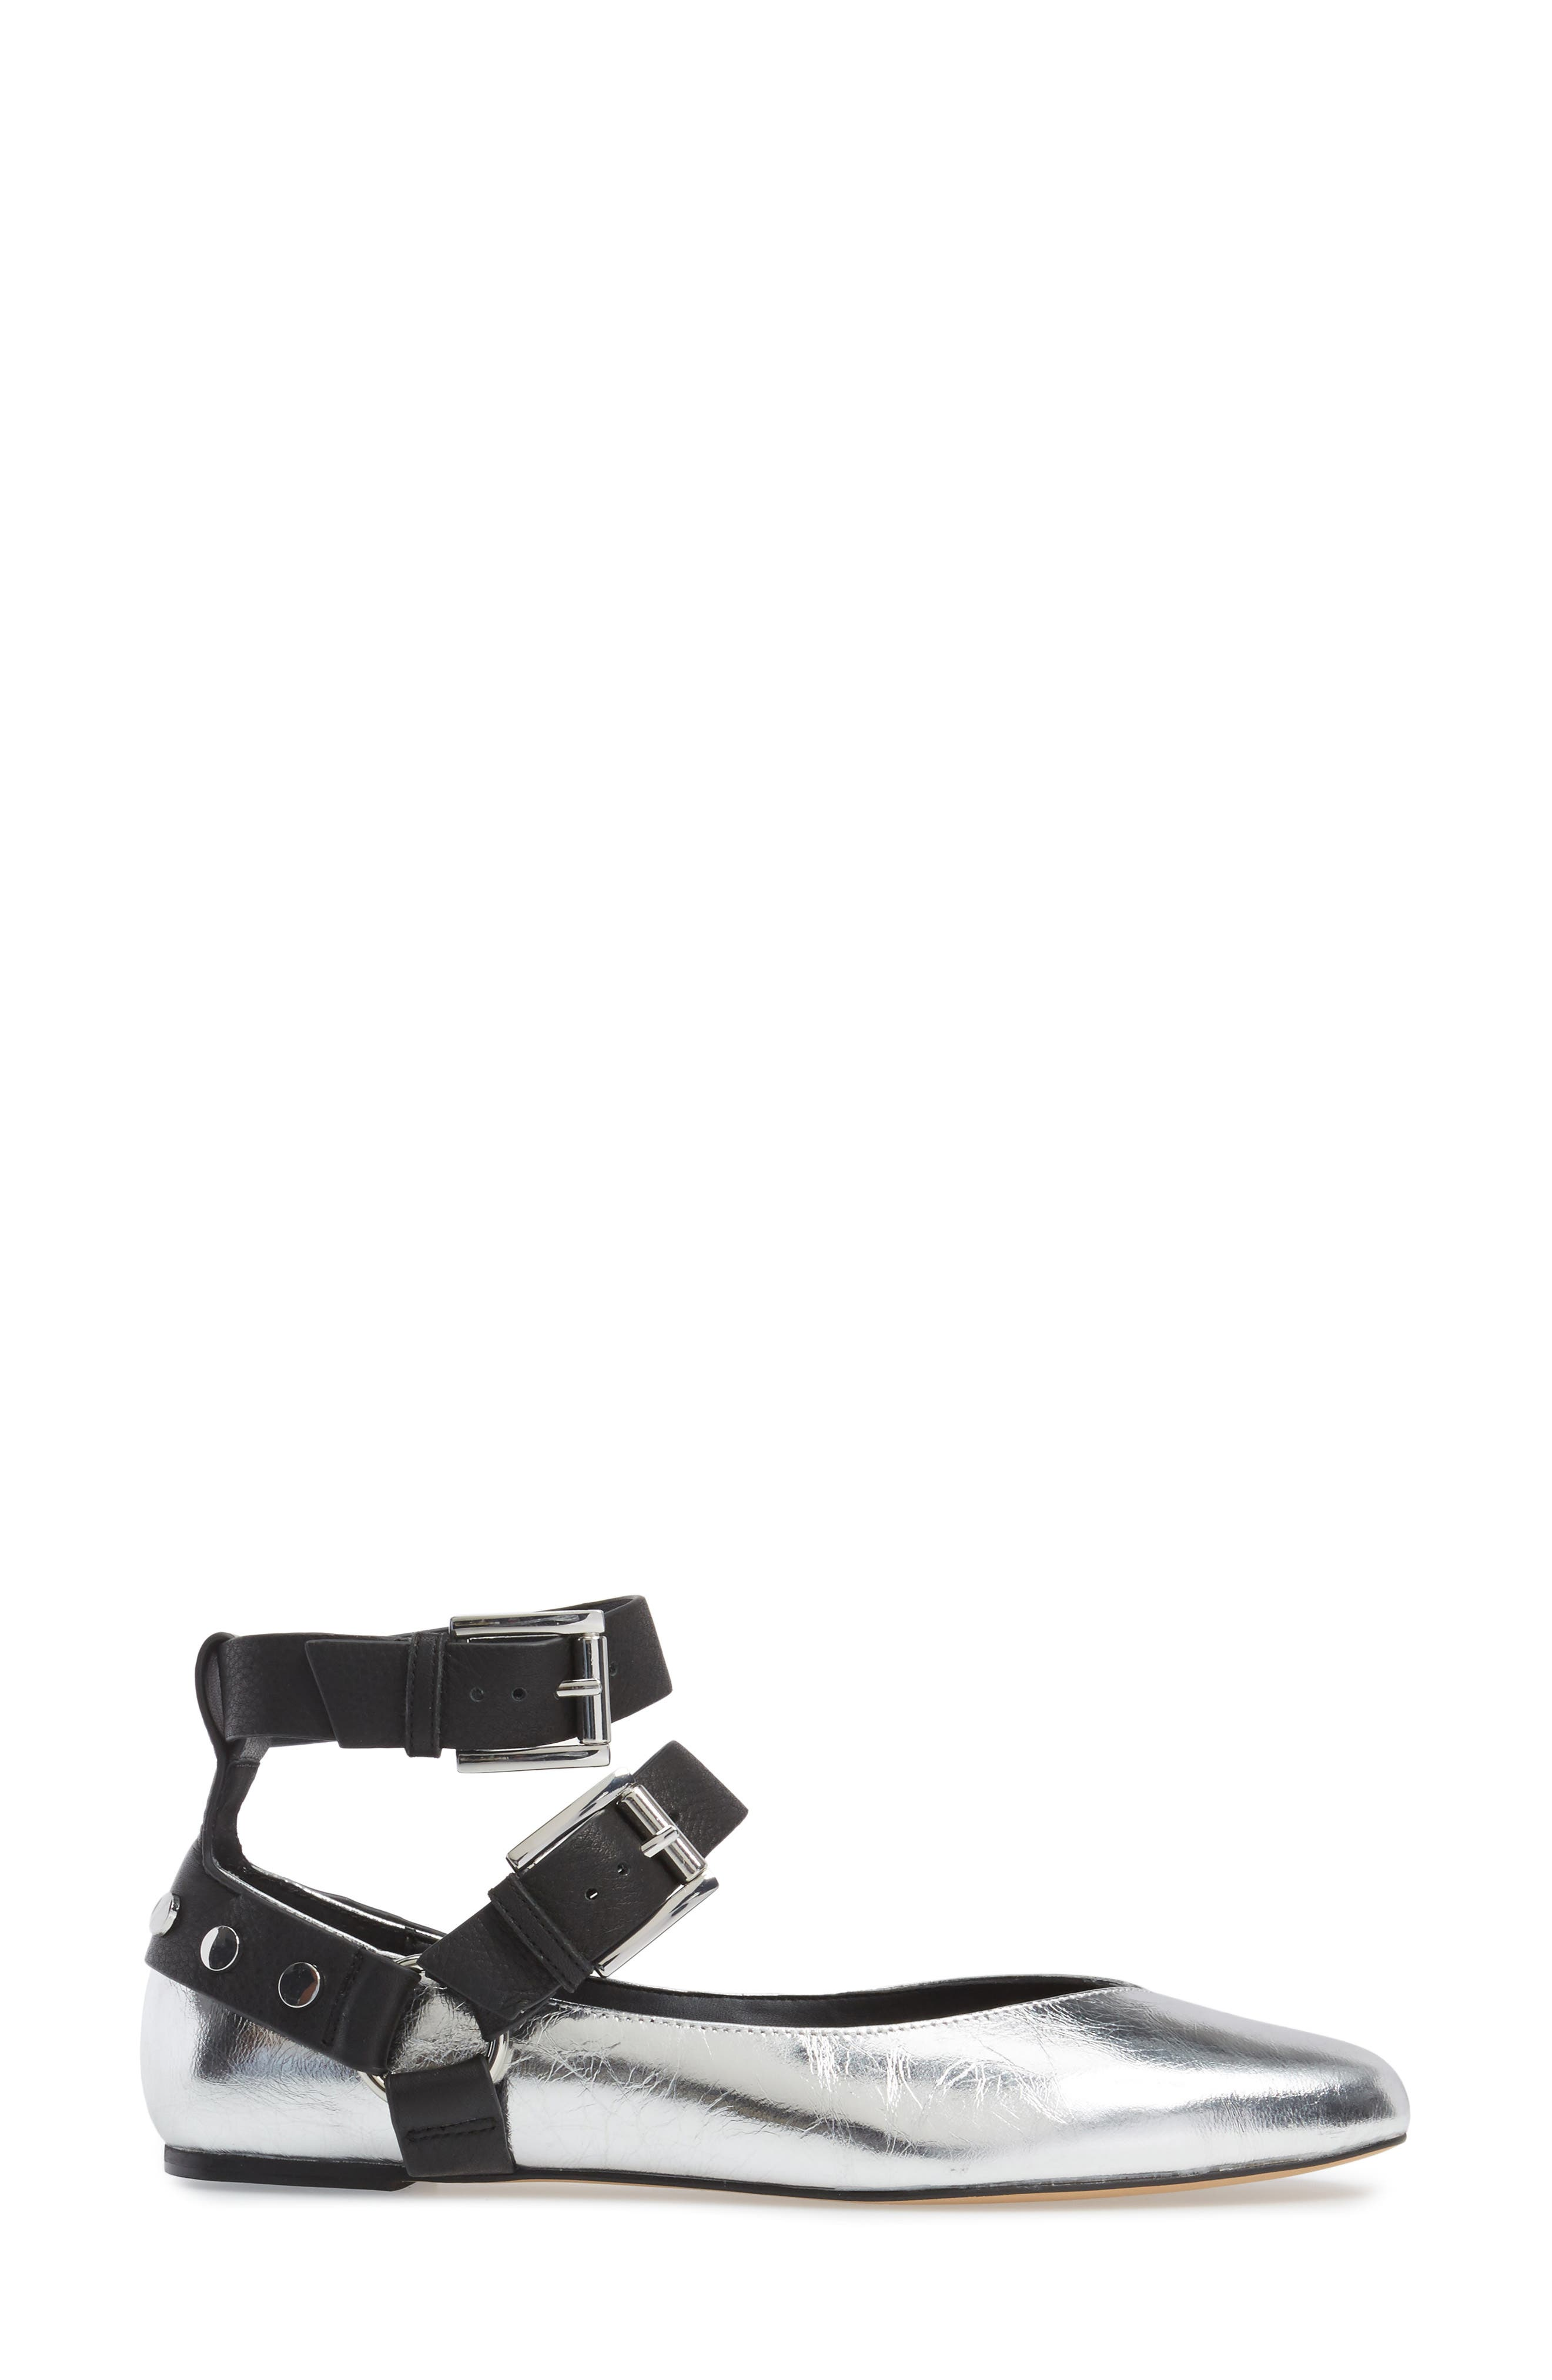 Alternate Image 3  - Rebecca Minkoff Vivica Ankle Strap Flat (Women)